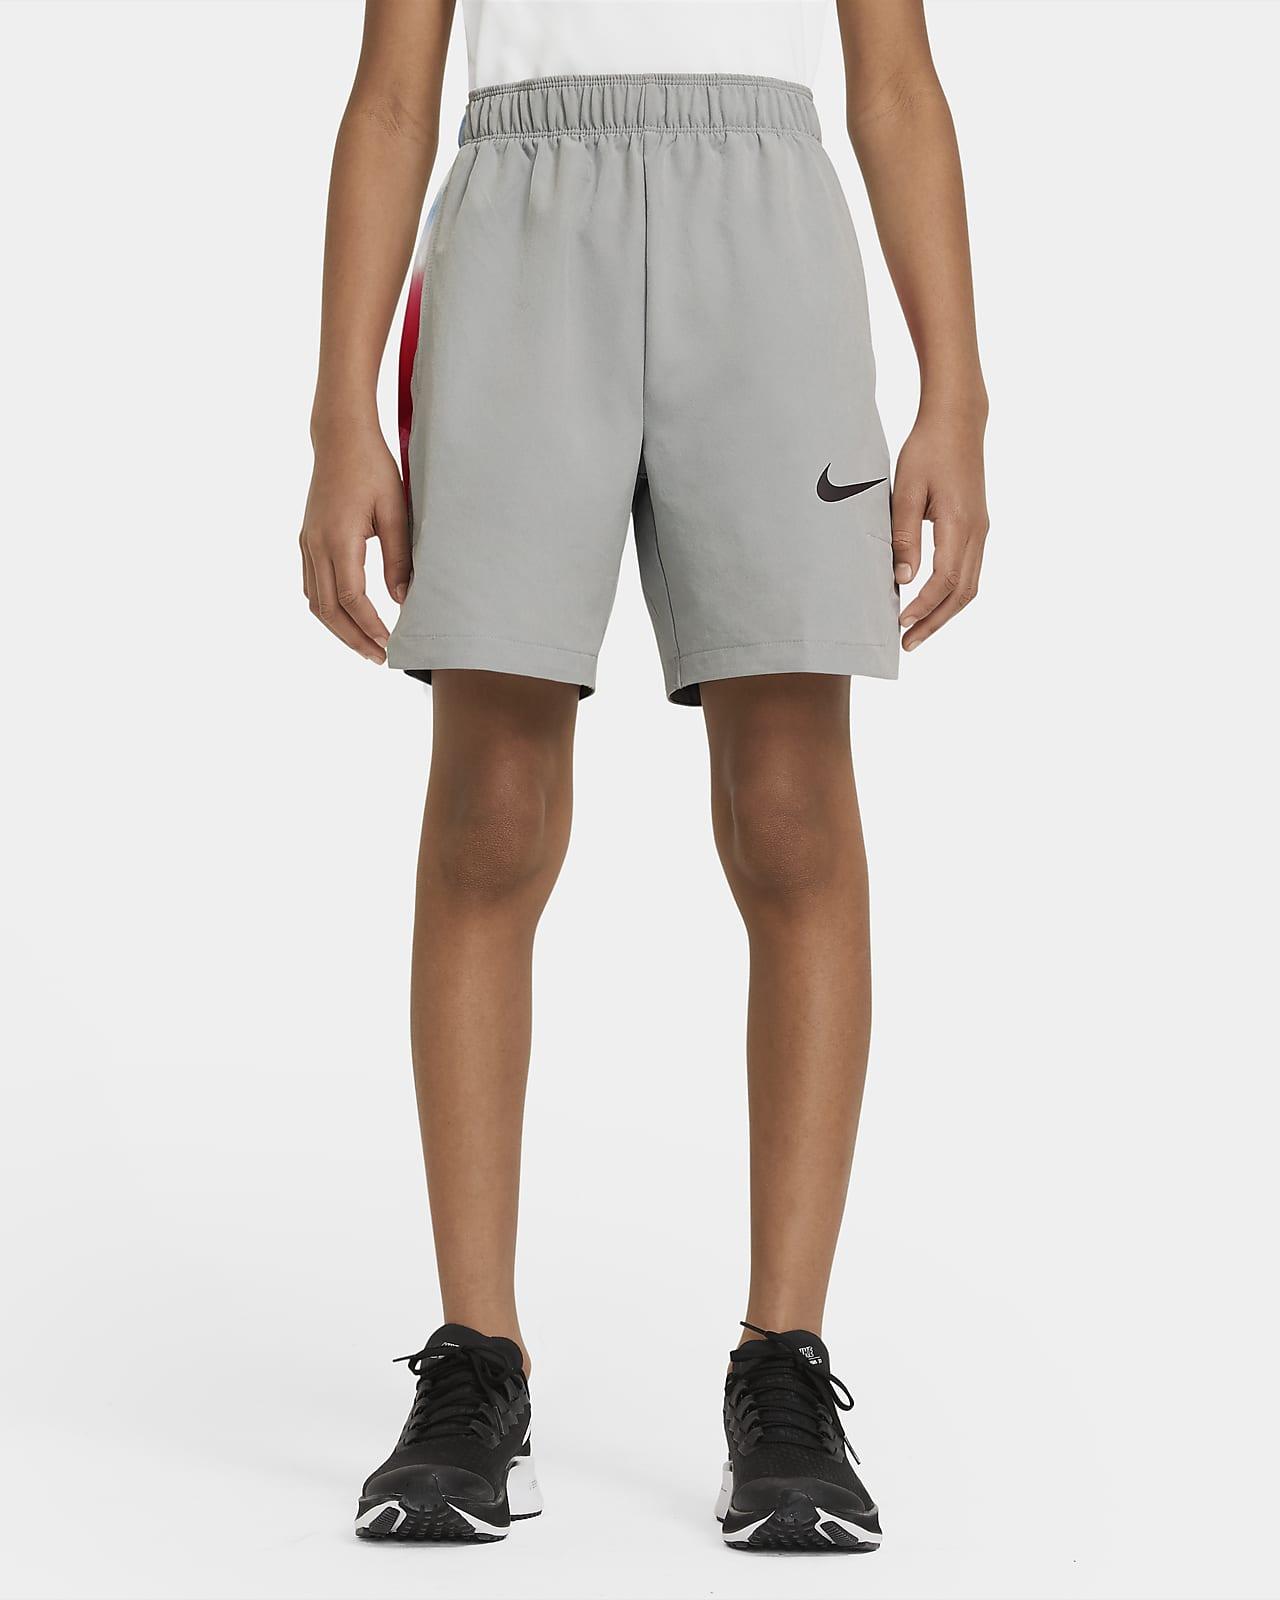 Nike Older Kids' (Boys') Woven Shorts